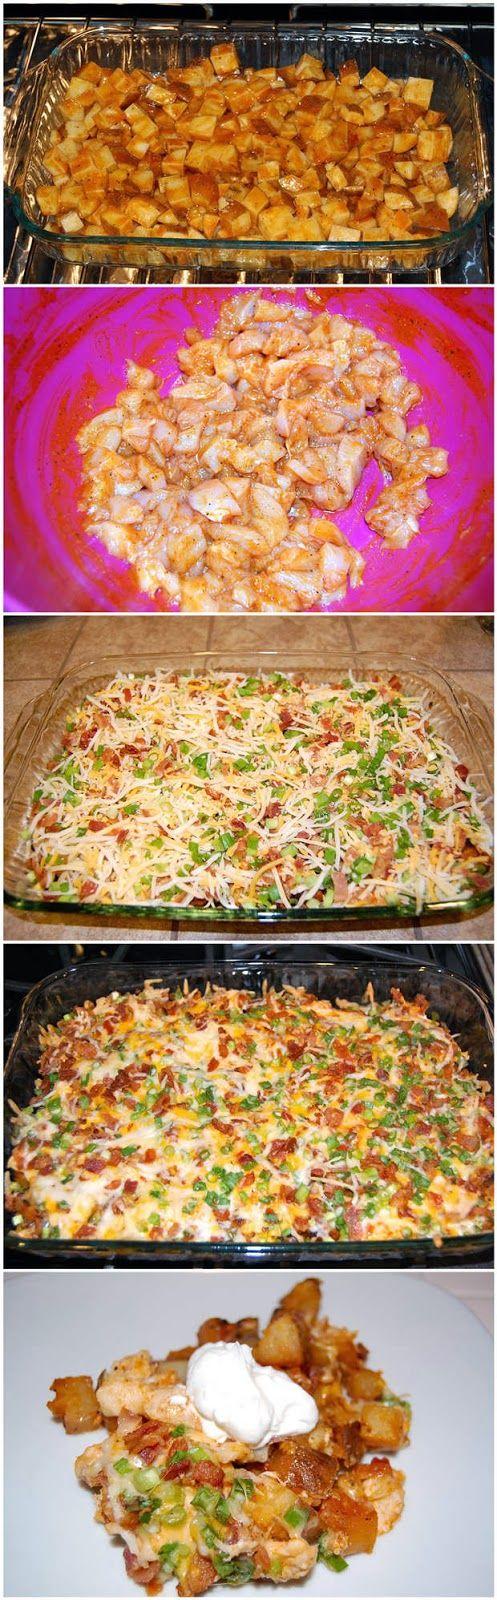 Loaded Baked Potato & Chicken Casserole - RedStarRecipe